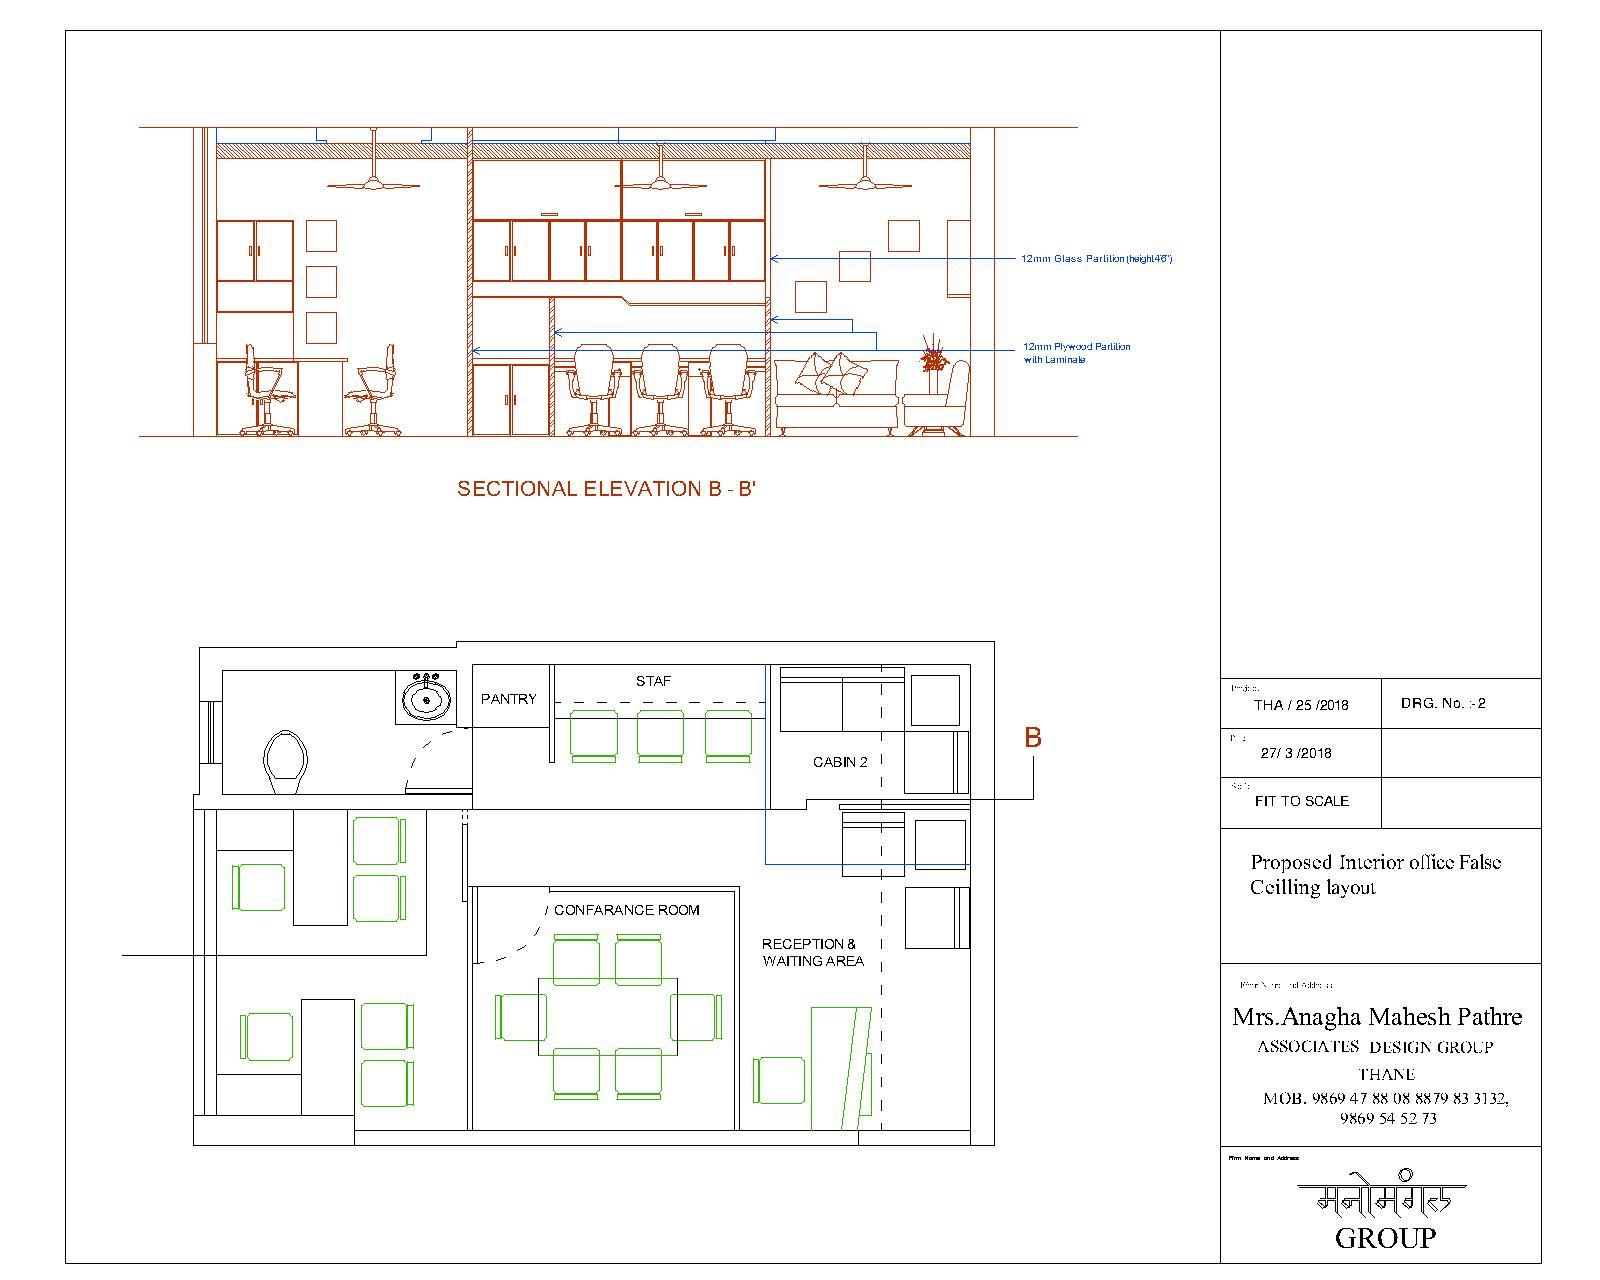 office-Layout-Elevation.jpg